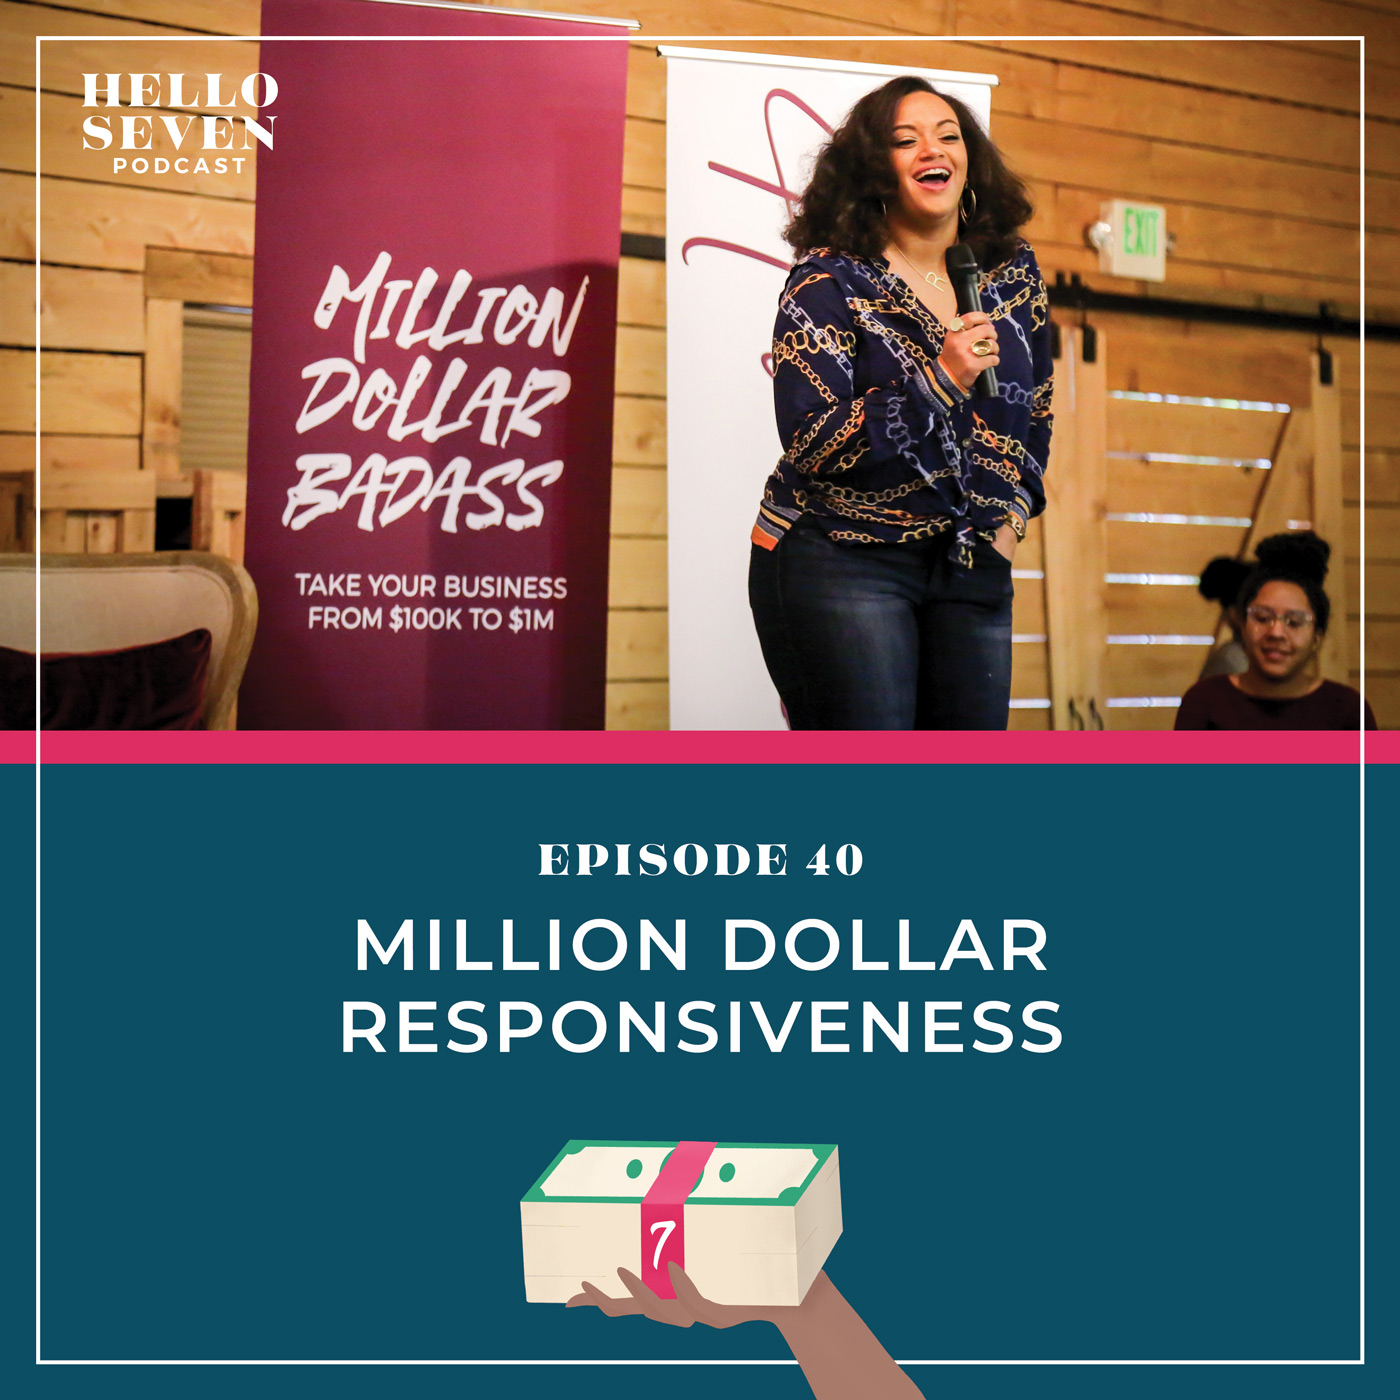 Million Dollar Responsiveness